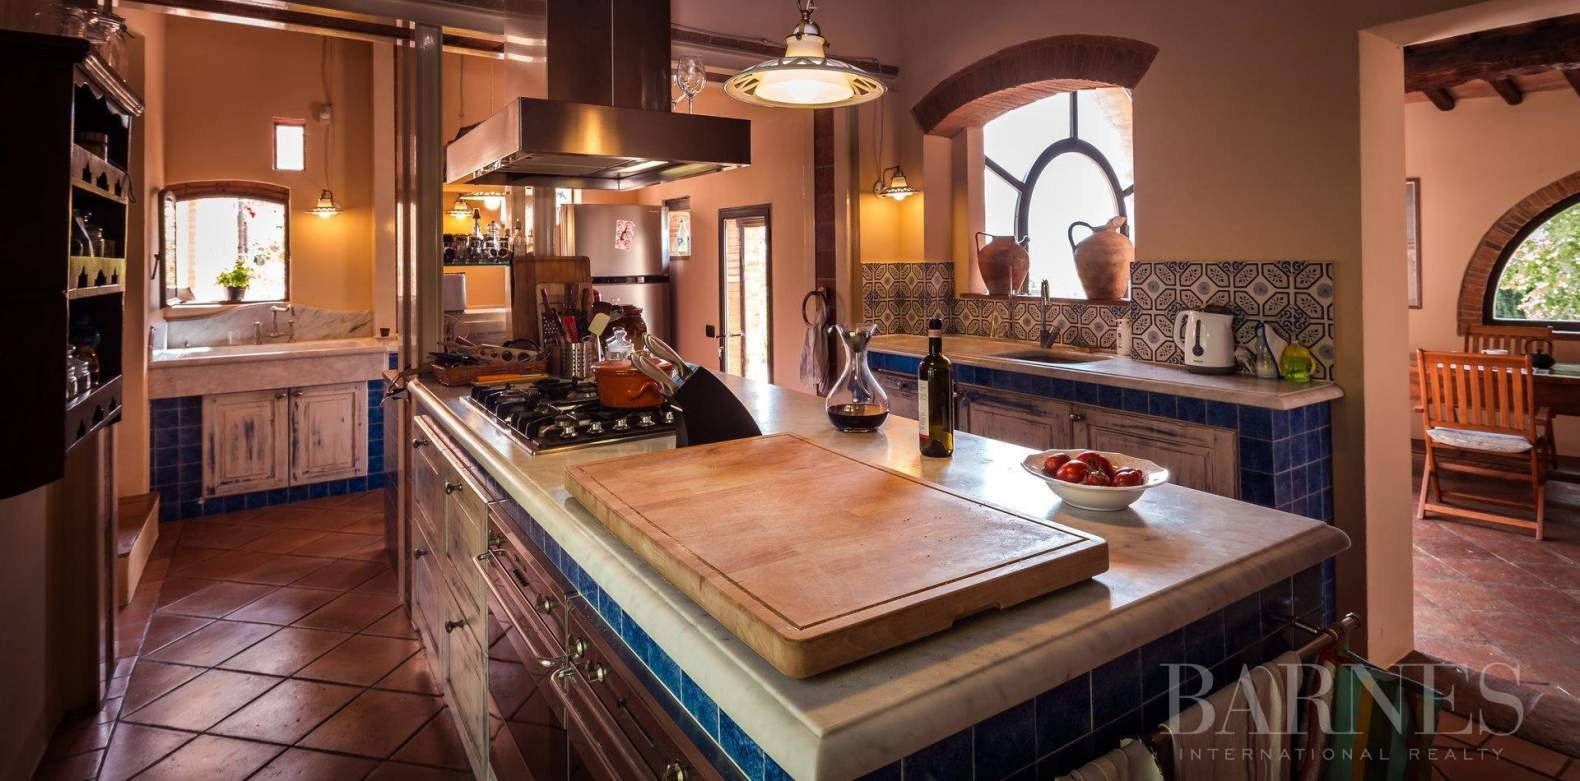 Barberino Tavarnelle  - Villa 10 Cuartos 9 Habitaciones - picture 9